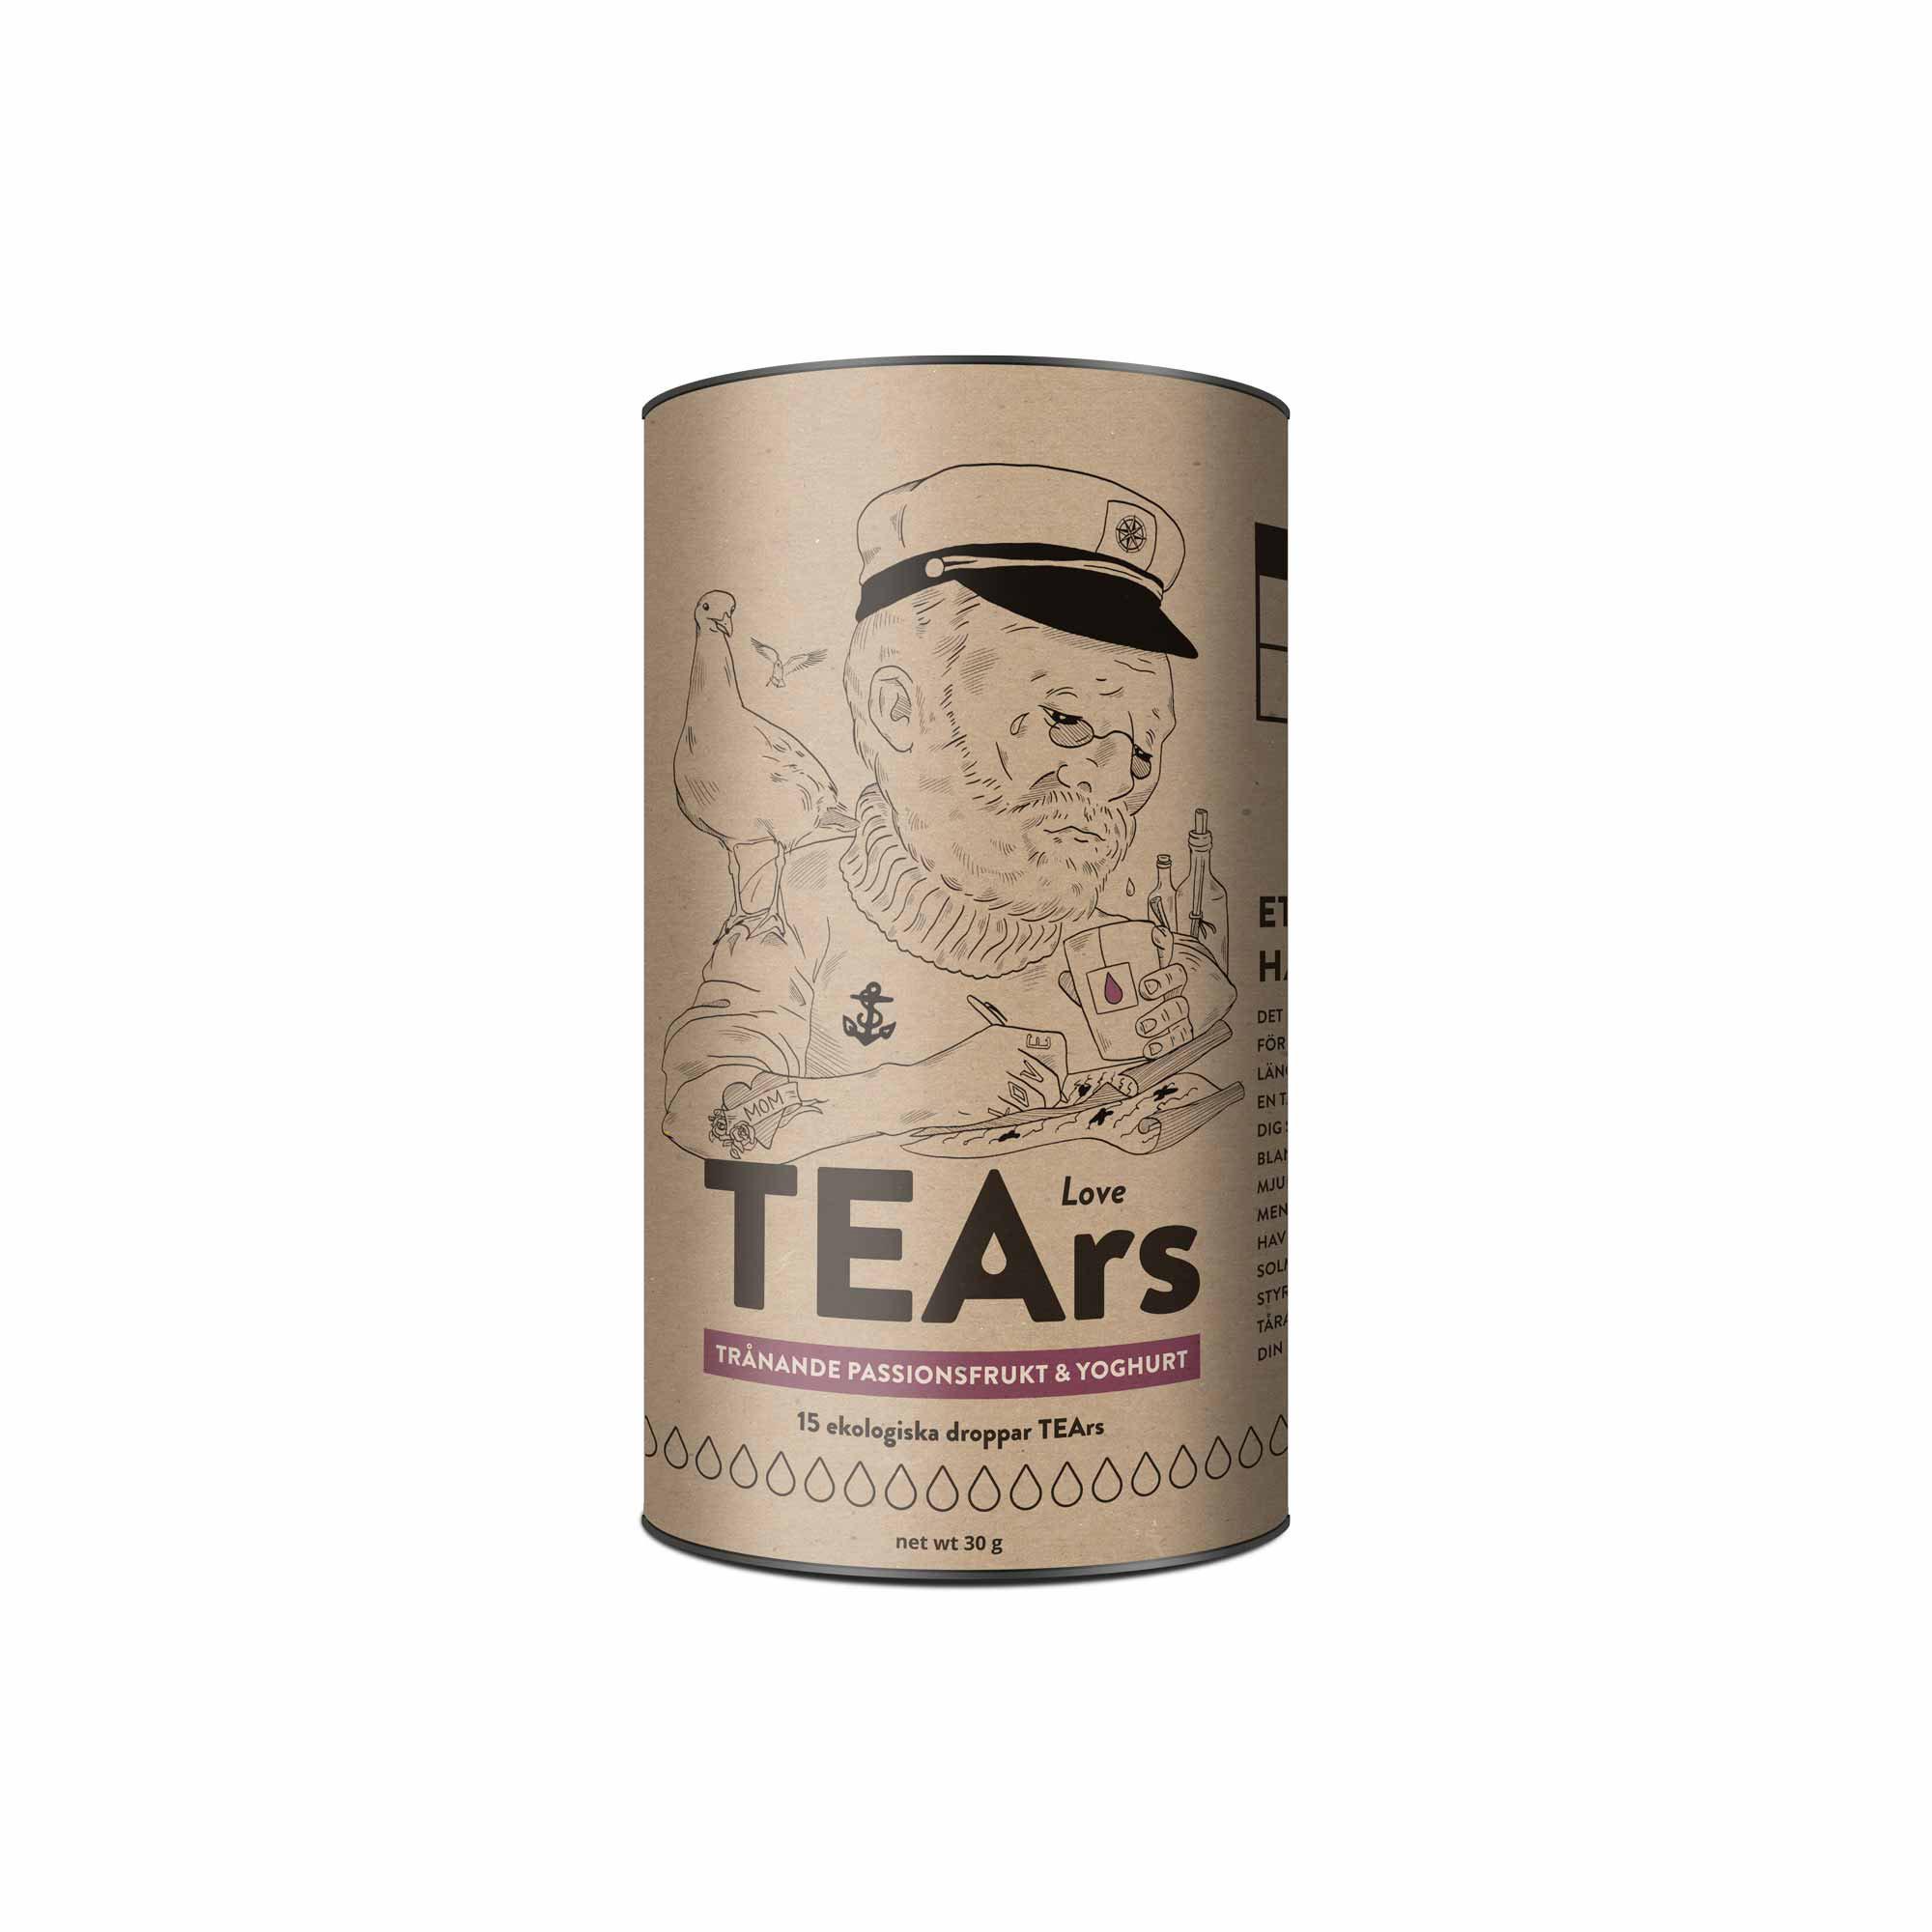 tea love tears ecological tea brand